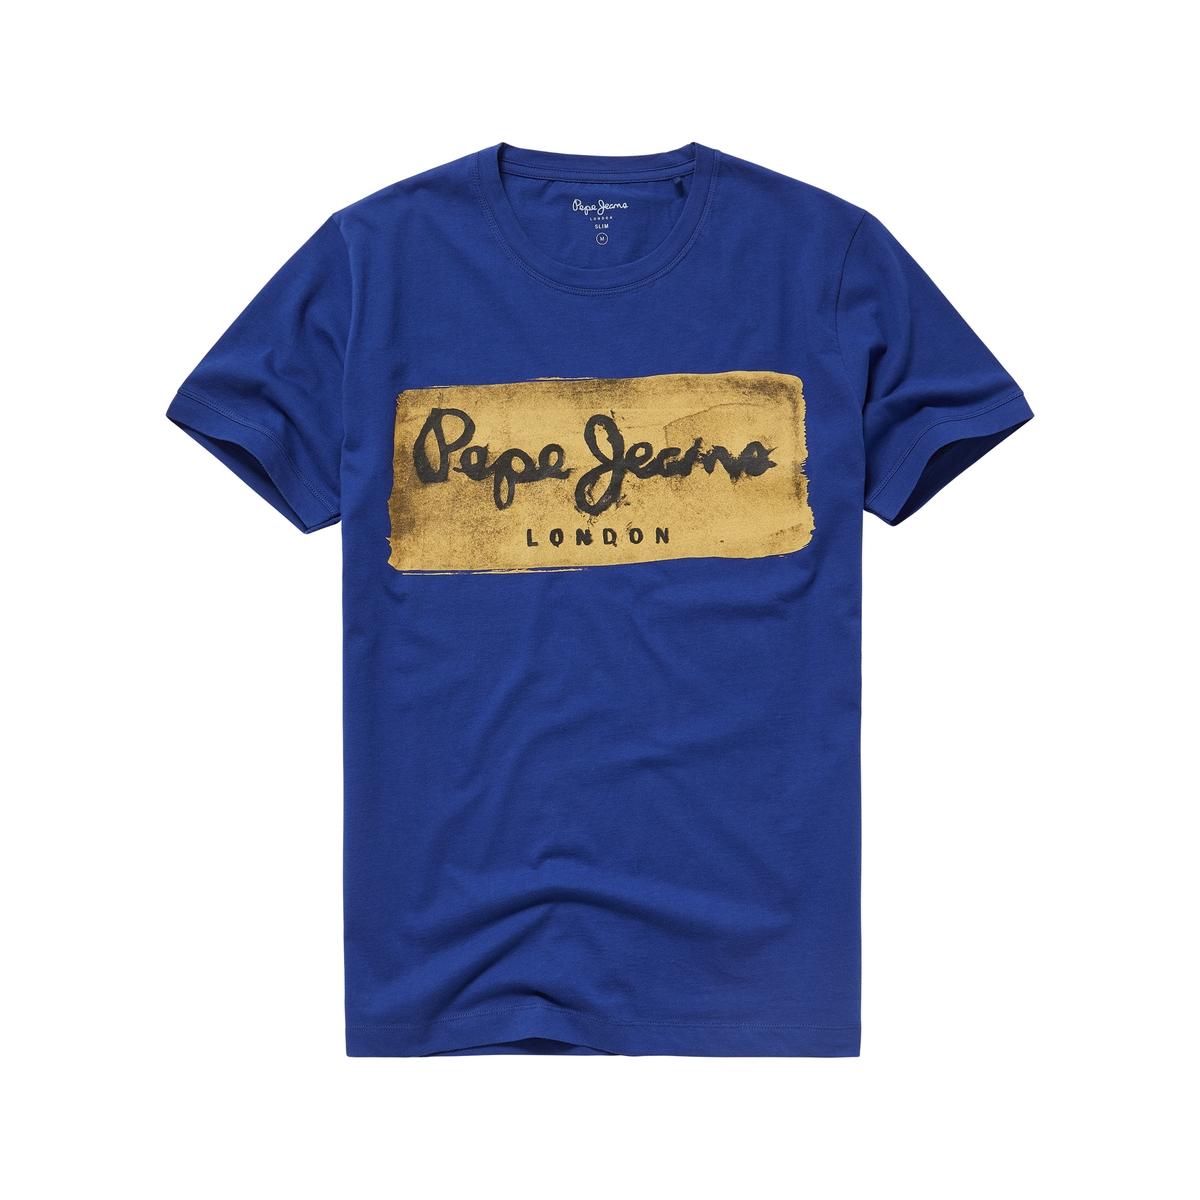 T-shirt Charing